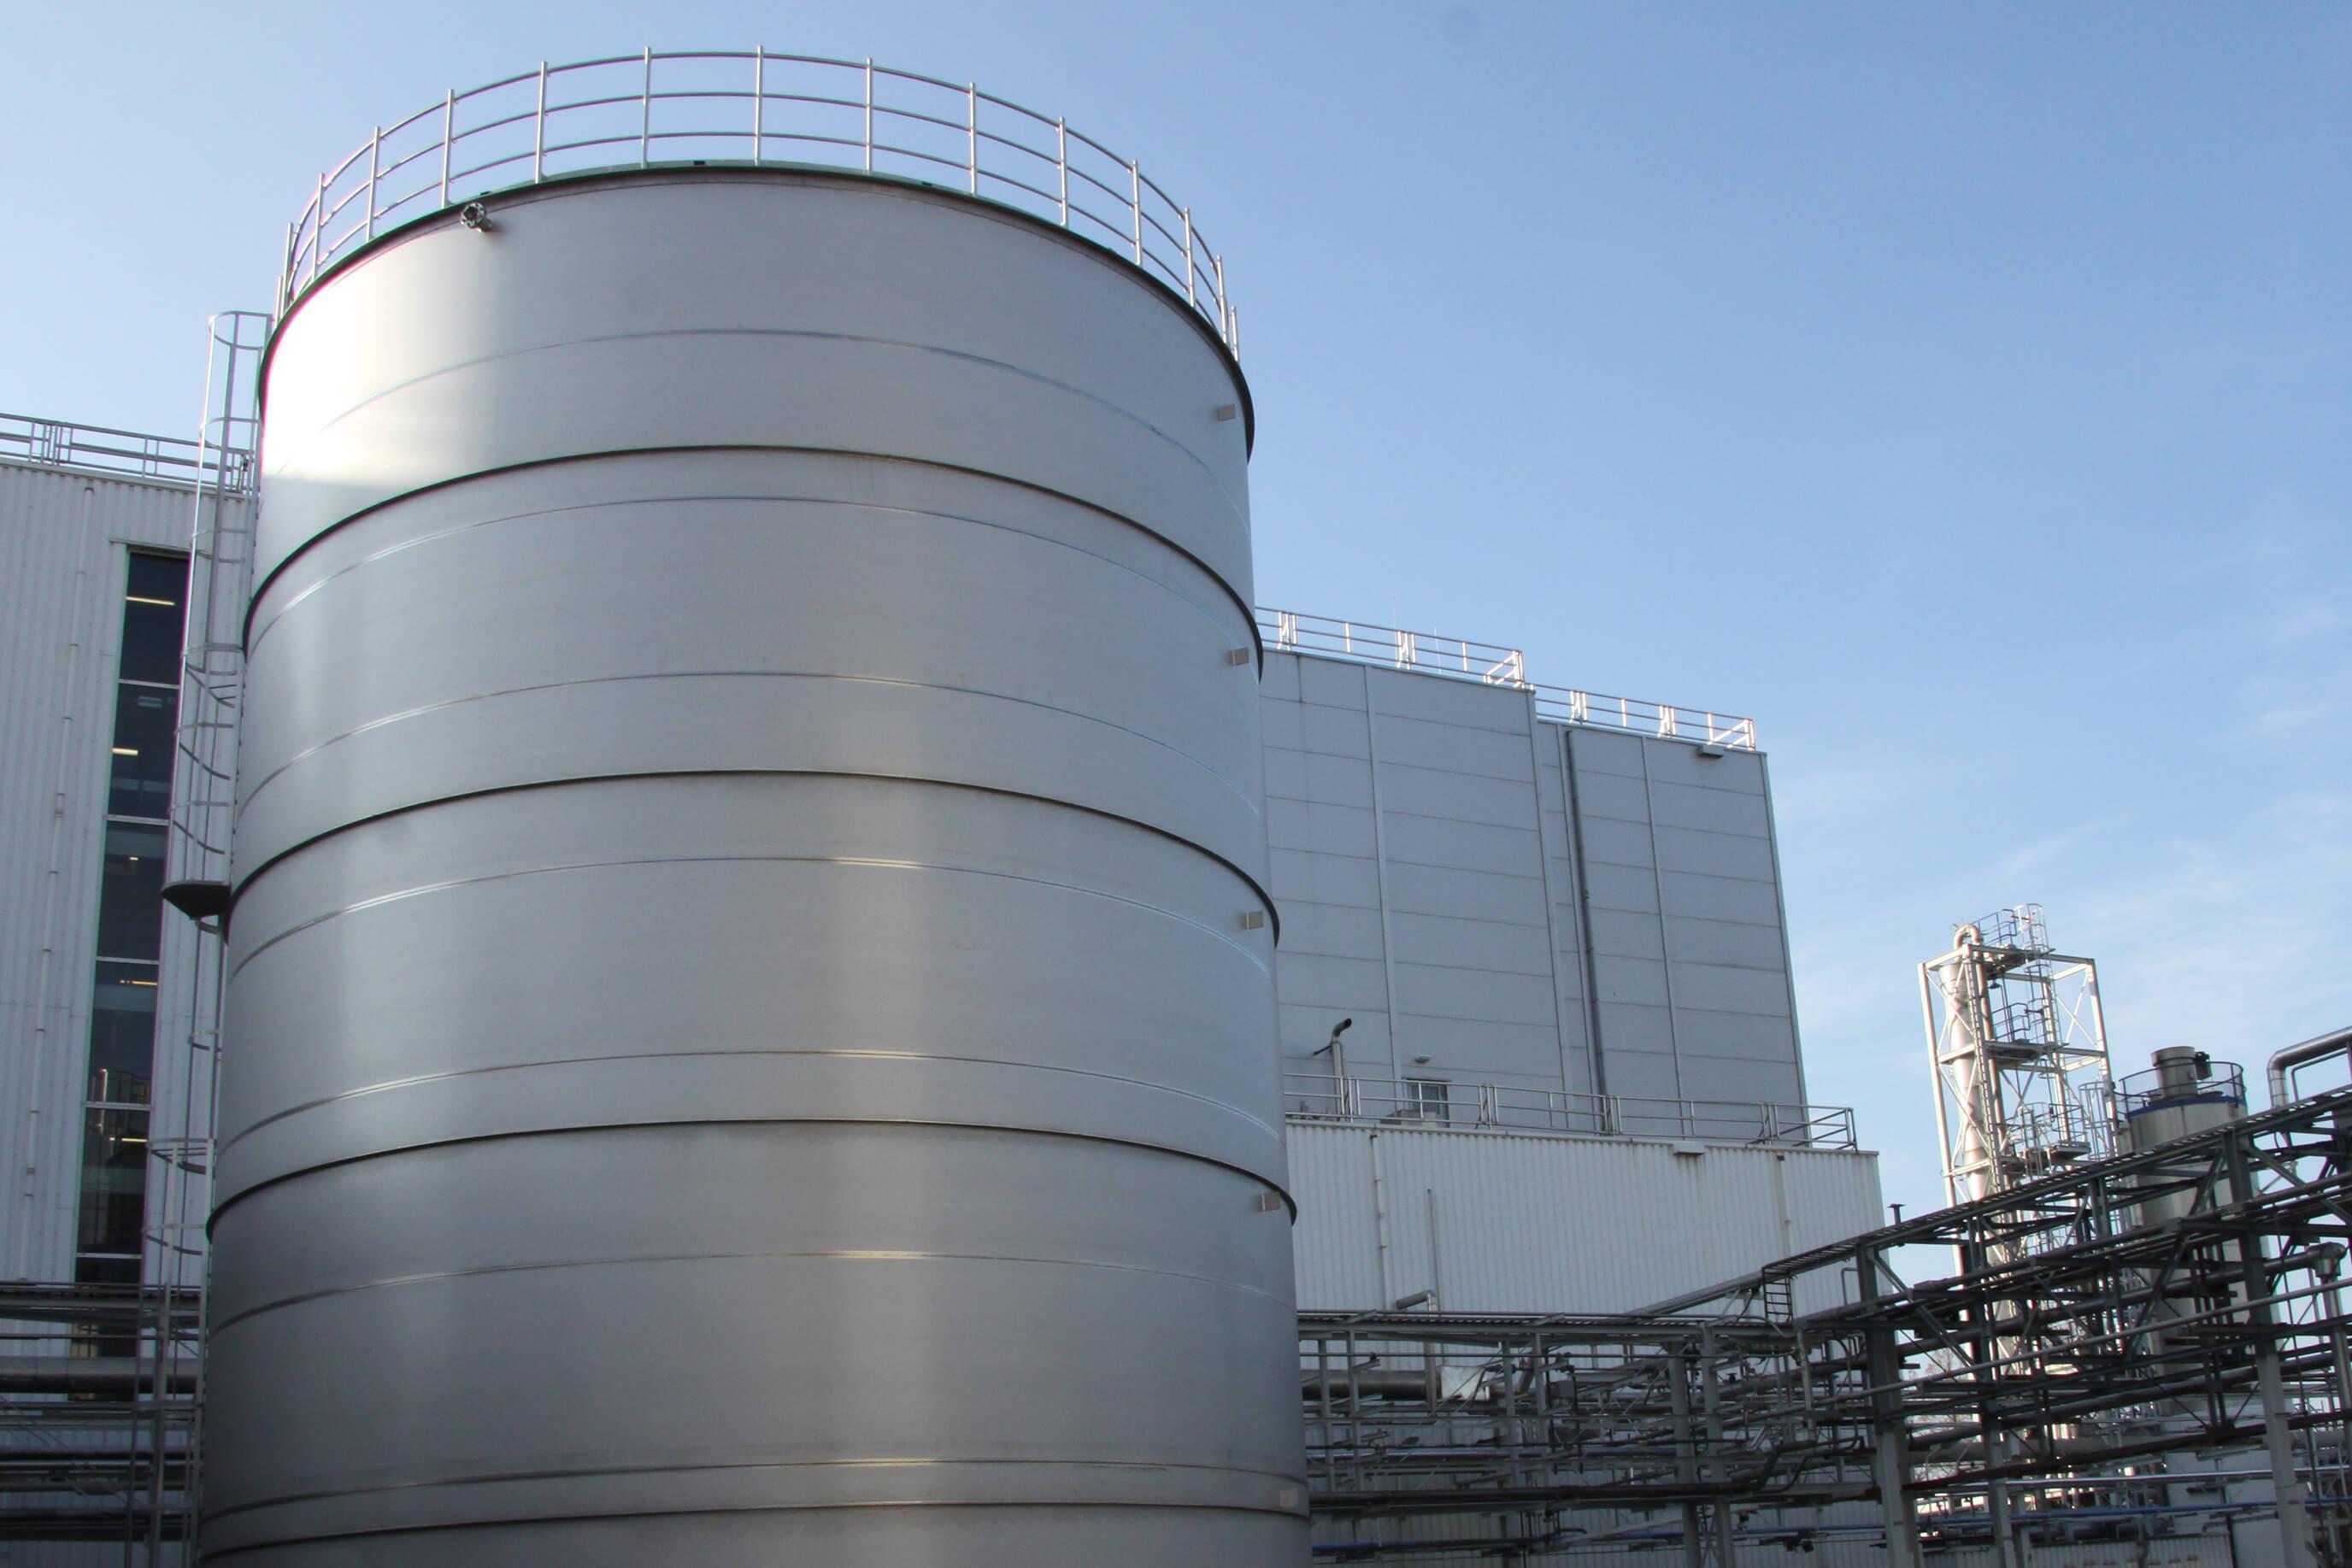 XL tank construction according to EN14015 and PGS 29